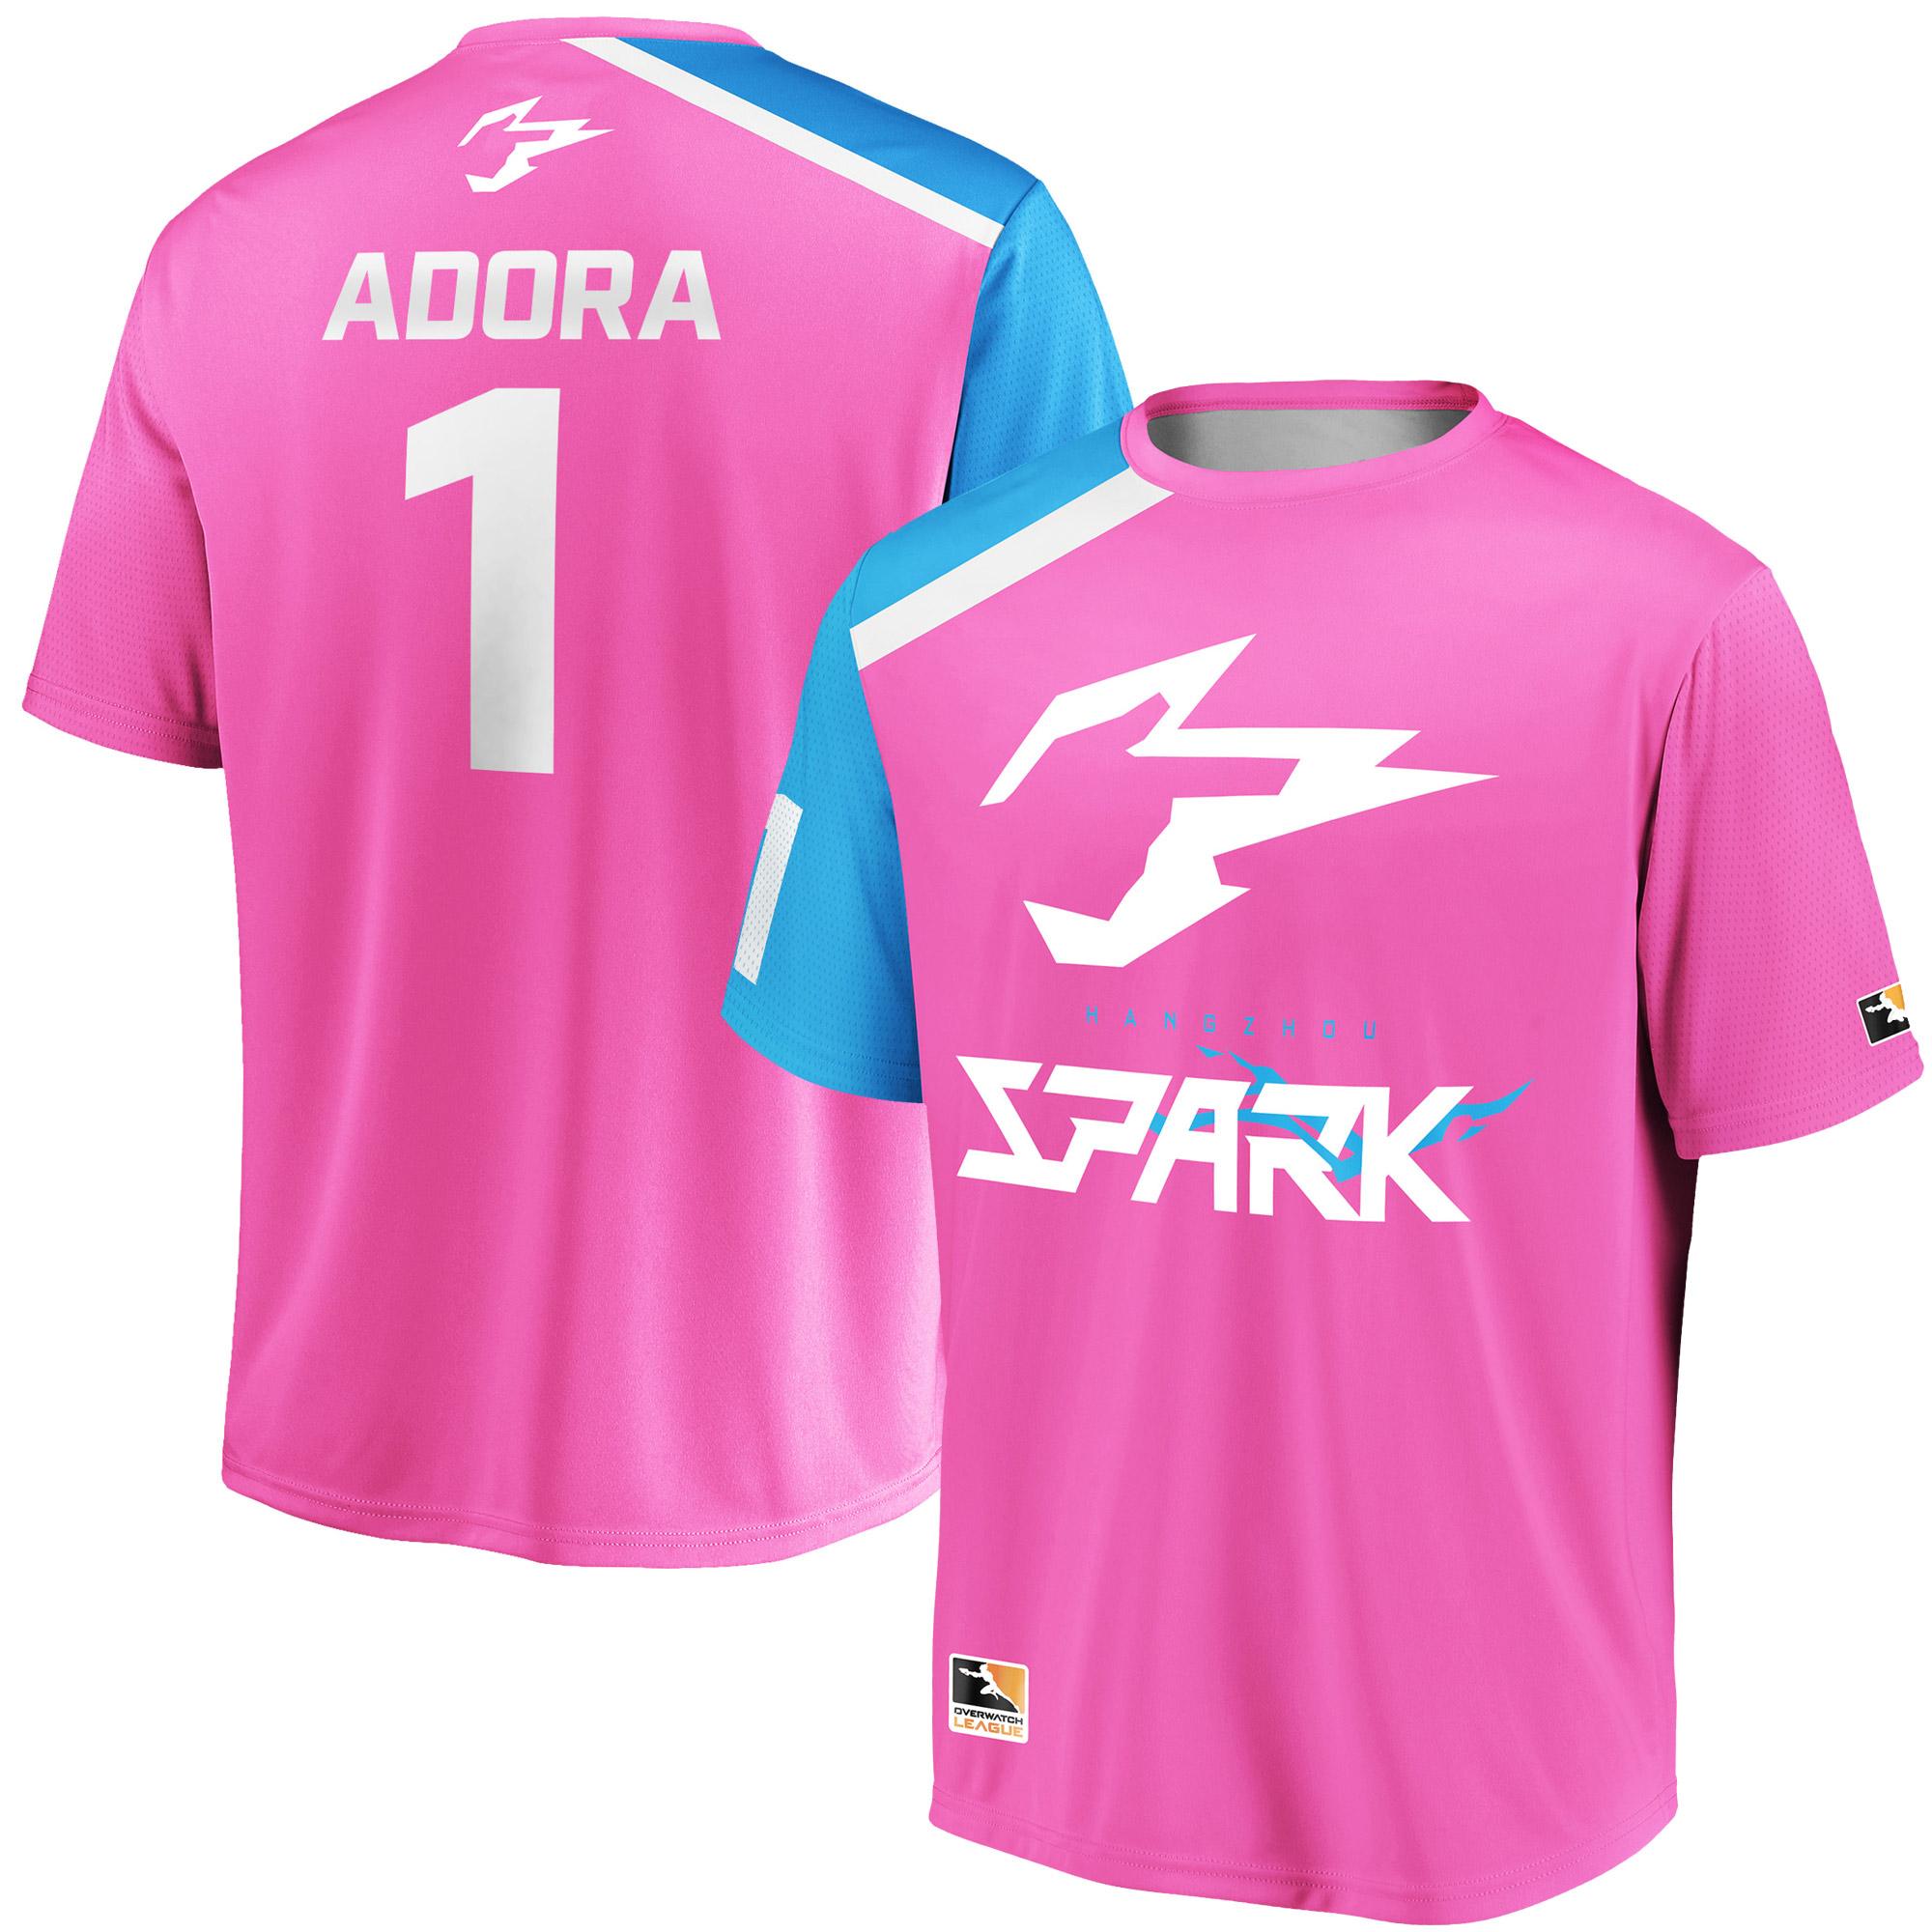 Adora Hangzhou Spark Overwatch League Replica Home Jersey - Pink